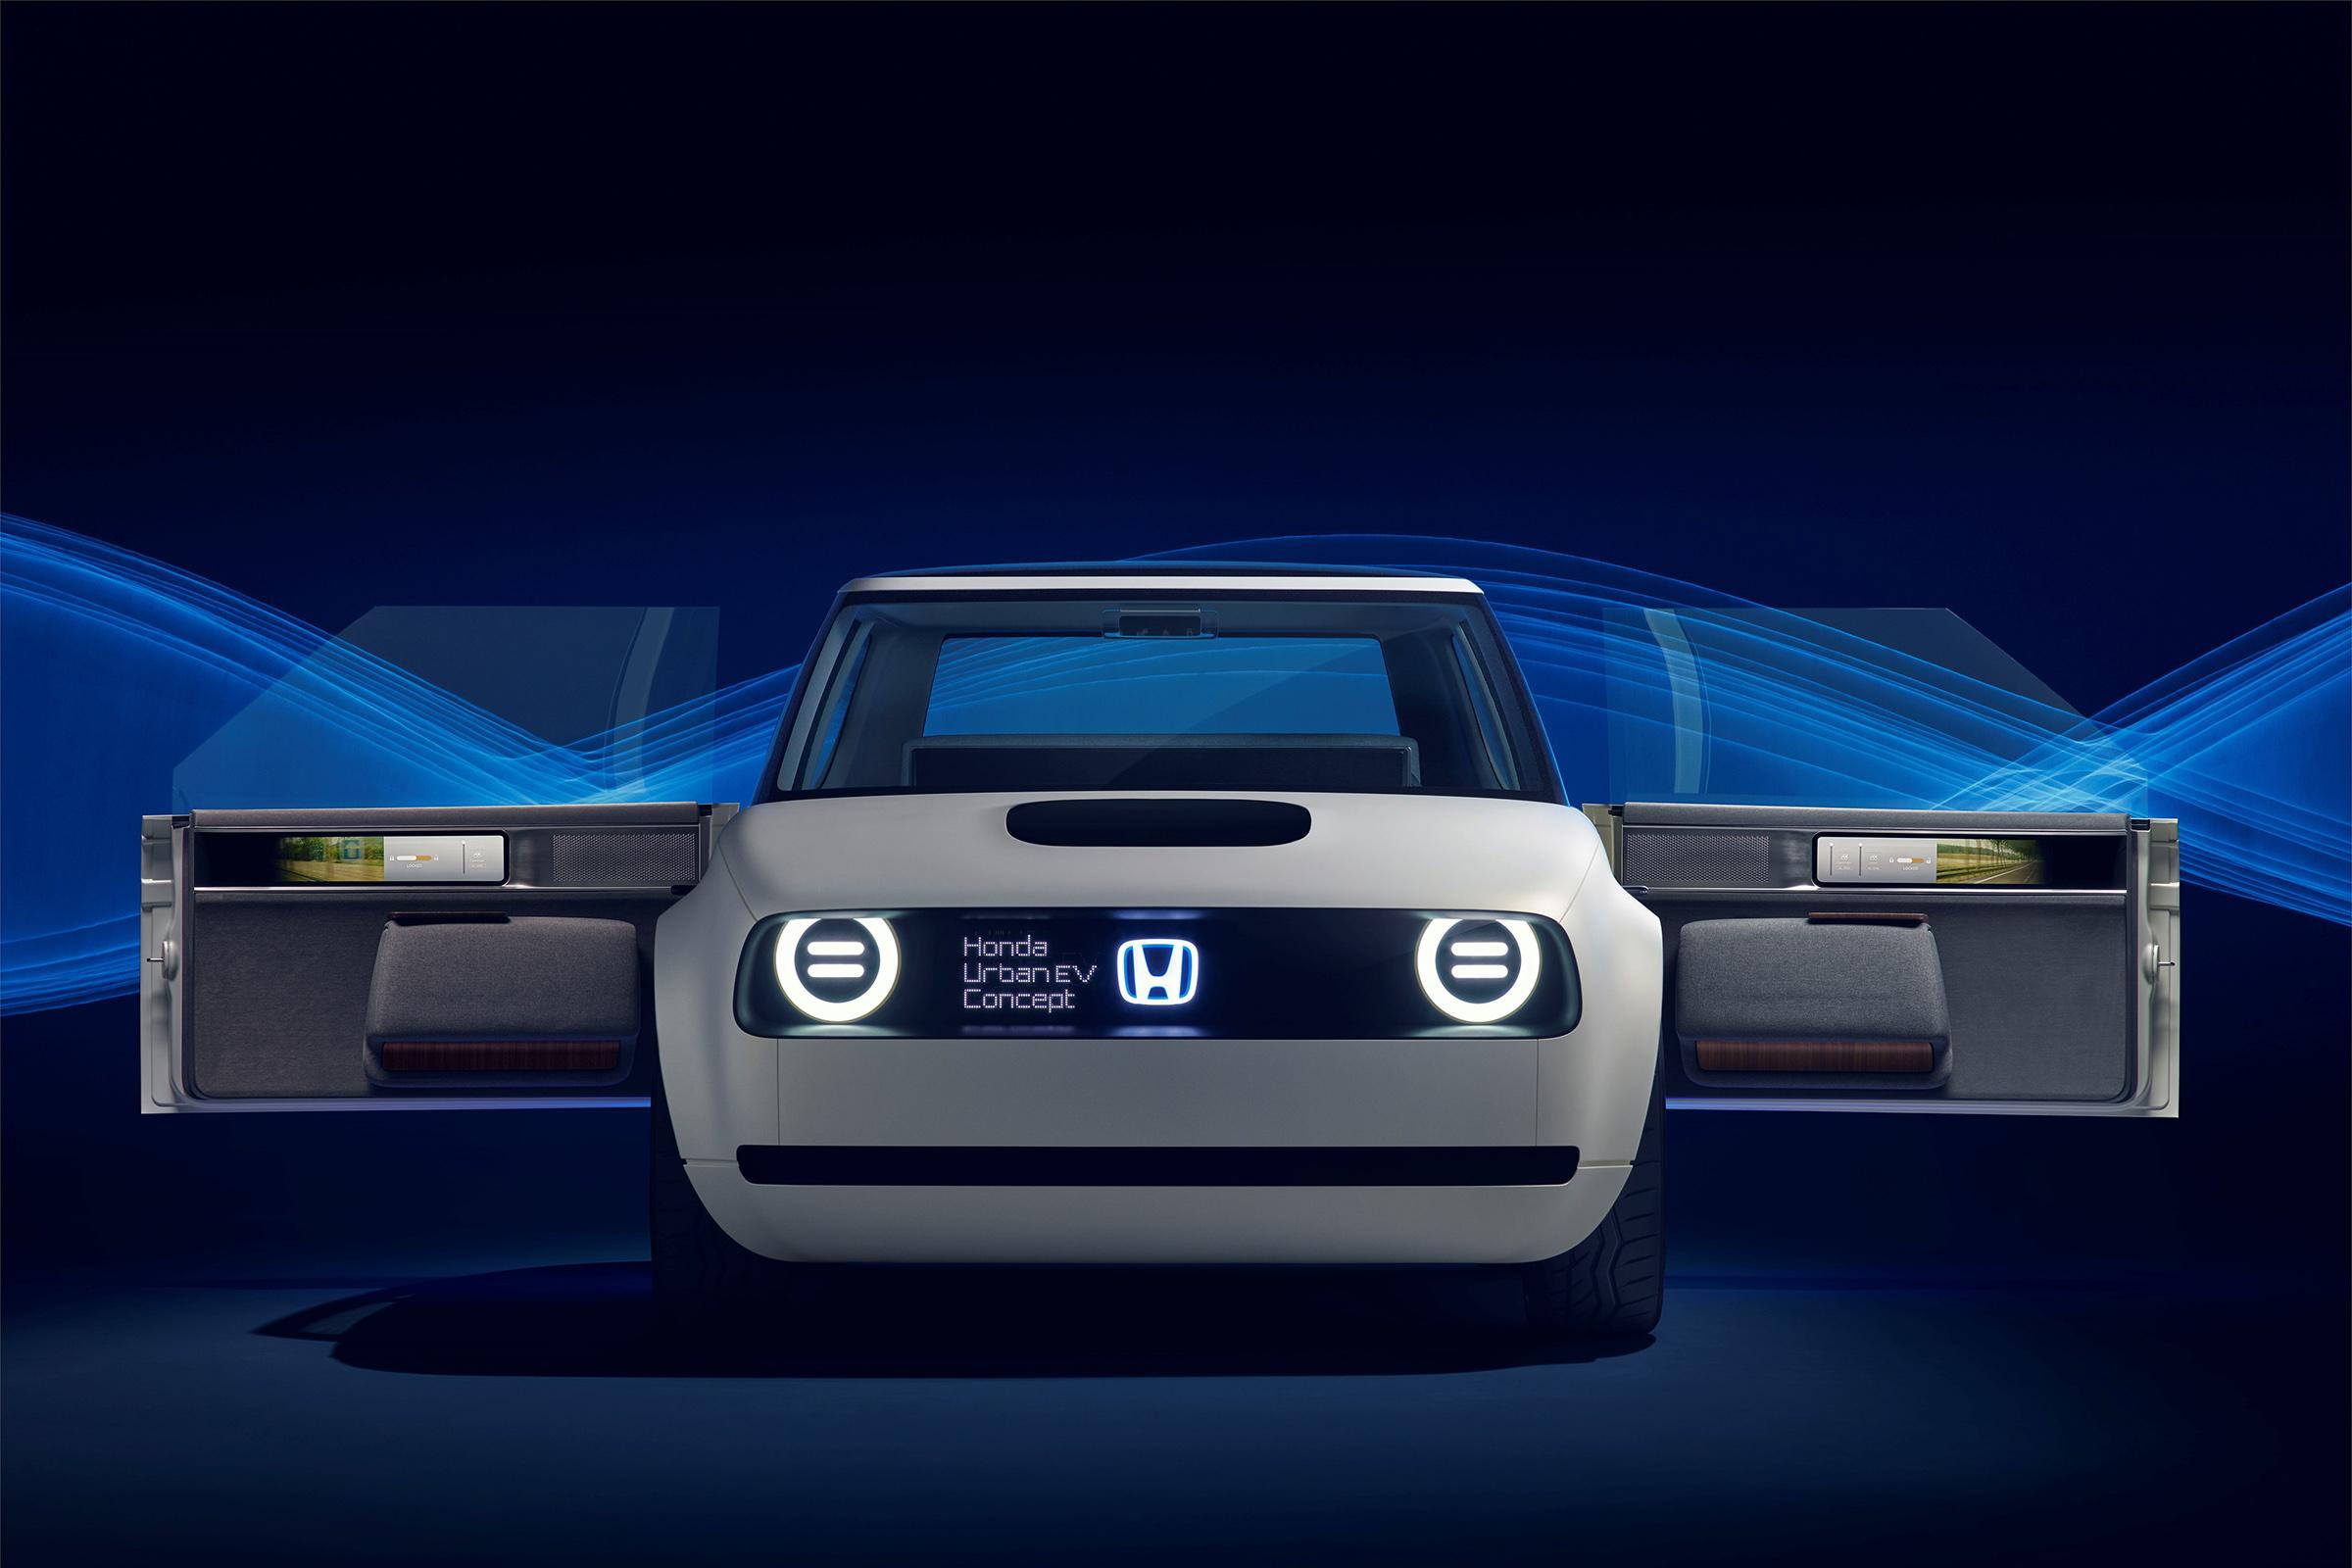 news honda s retro electric civic confirmed for production japanese nostalgic car. Black Bedroom Furniture Sets. Home Design Ideas